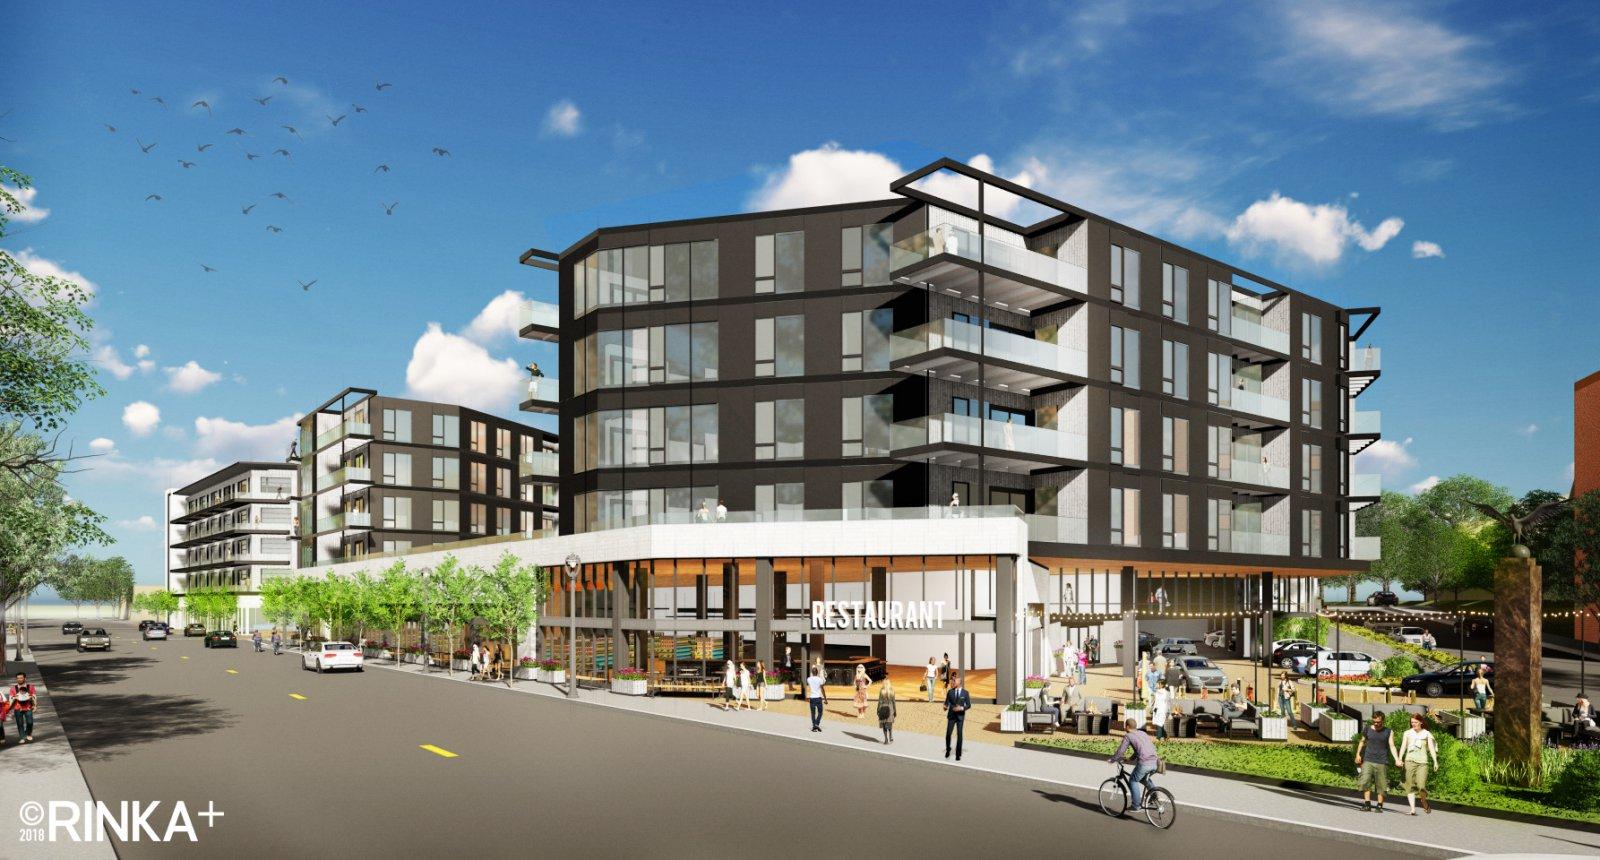 Updated 2700 S. Kinnickinnic Ave. Block Rendering